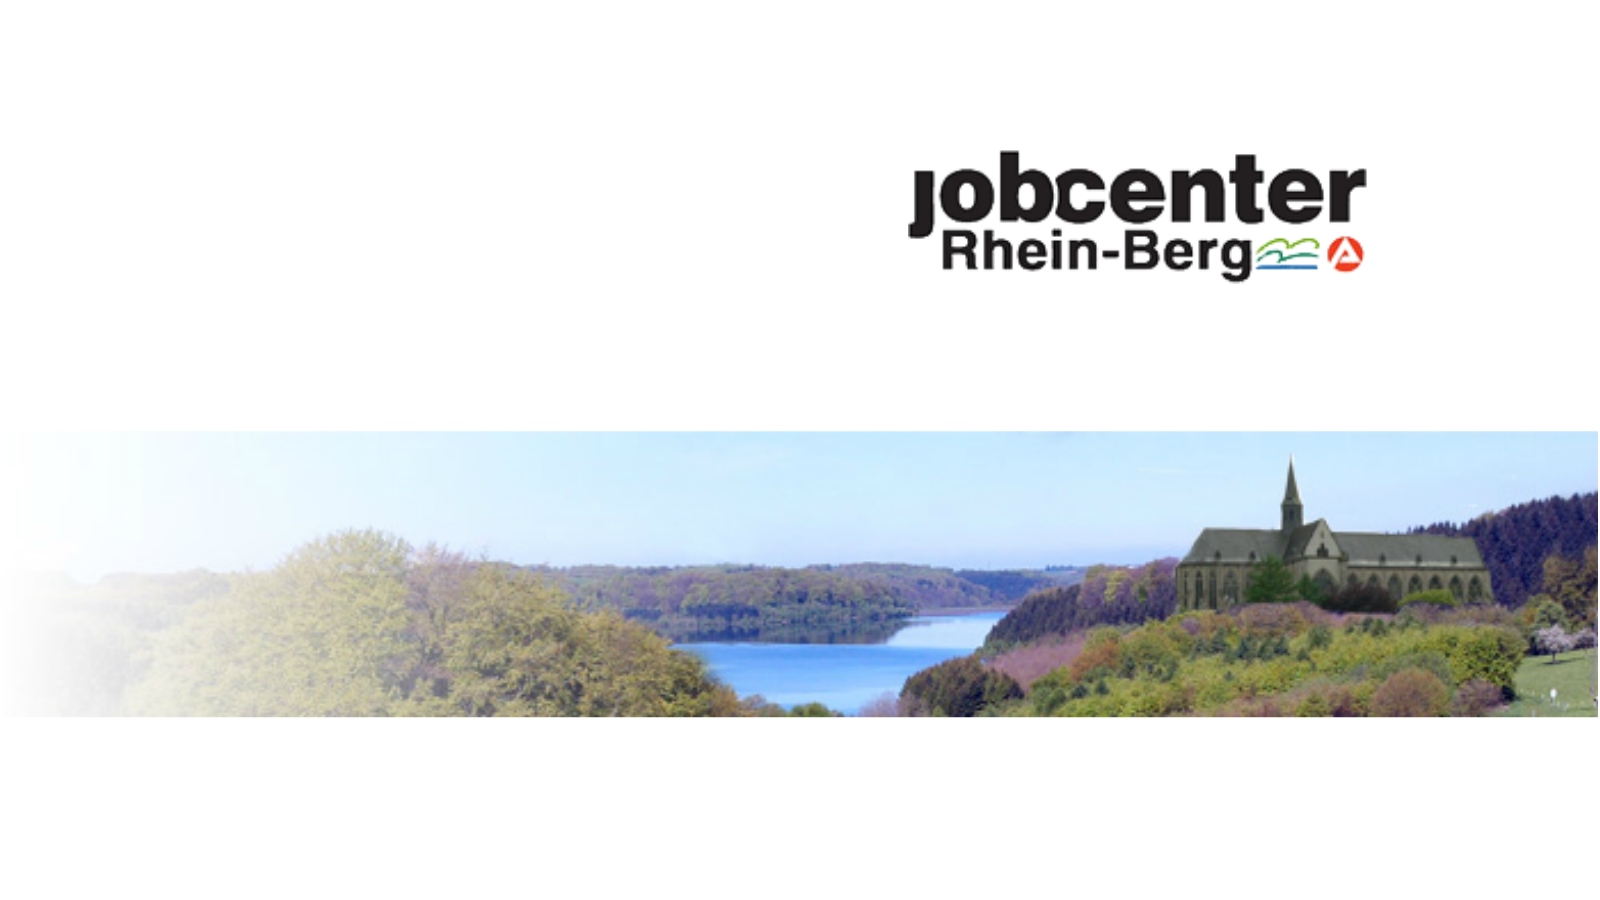 Jobcenter Rhein-Berg